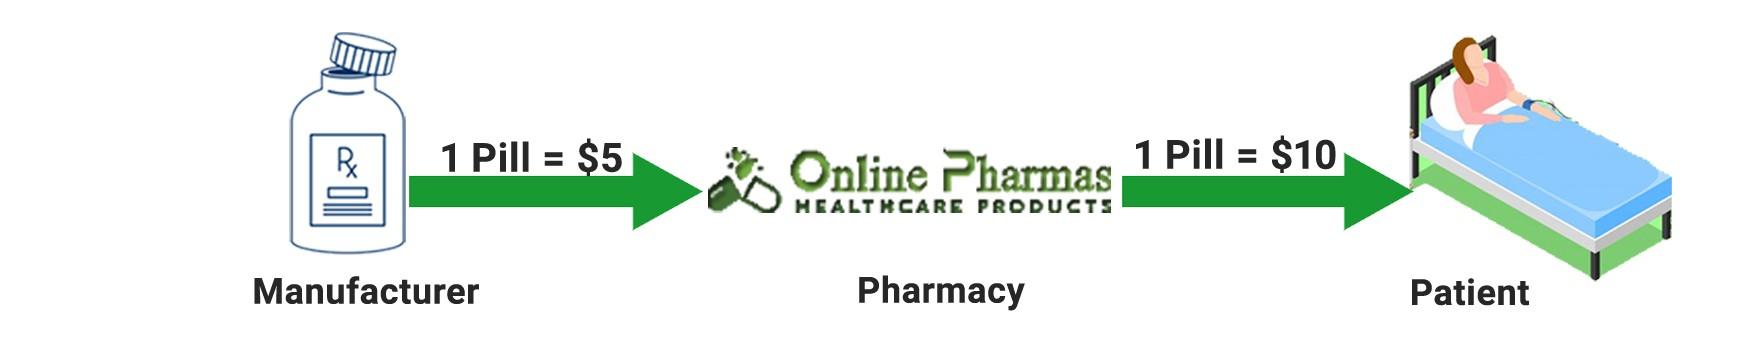 online pharmas process